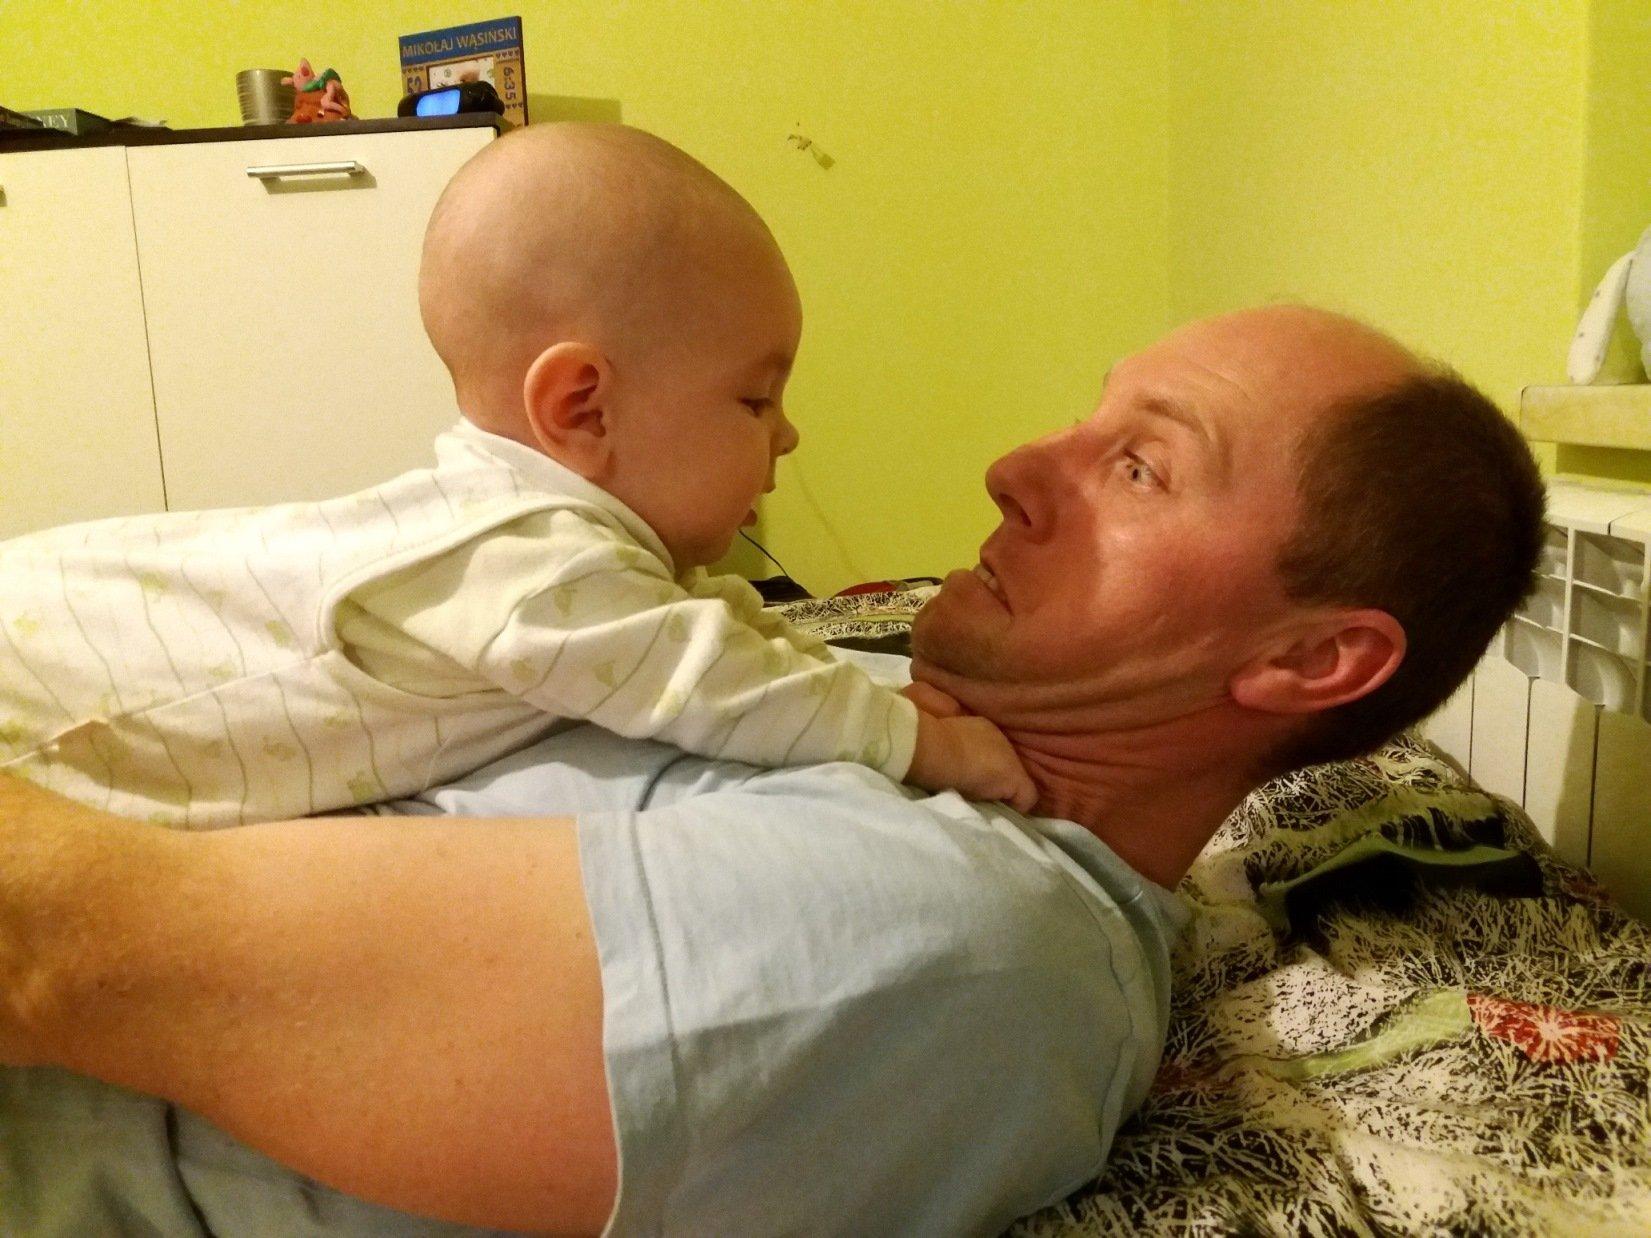 Tak mocno Cię kocham tatusiu :)